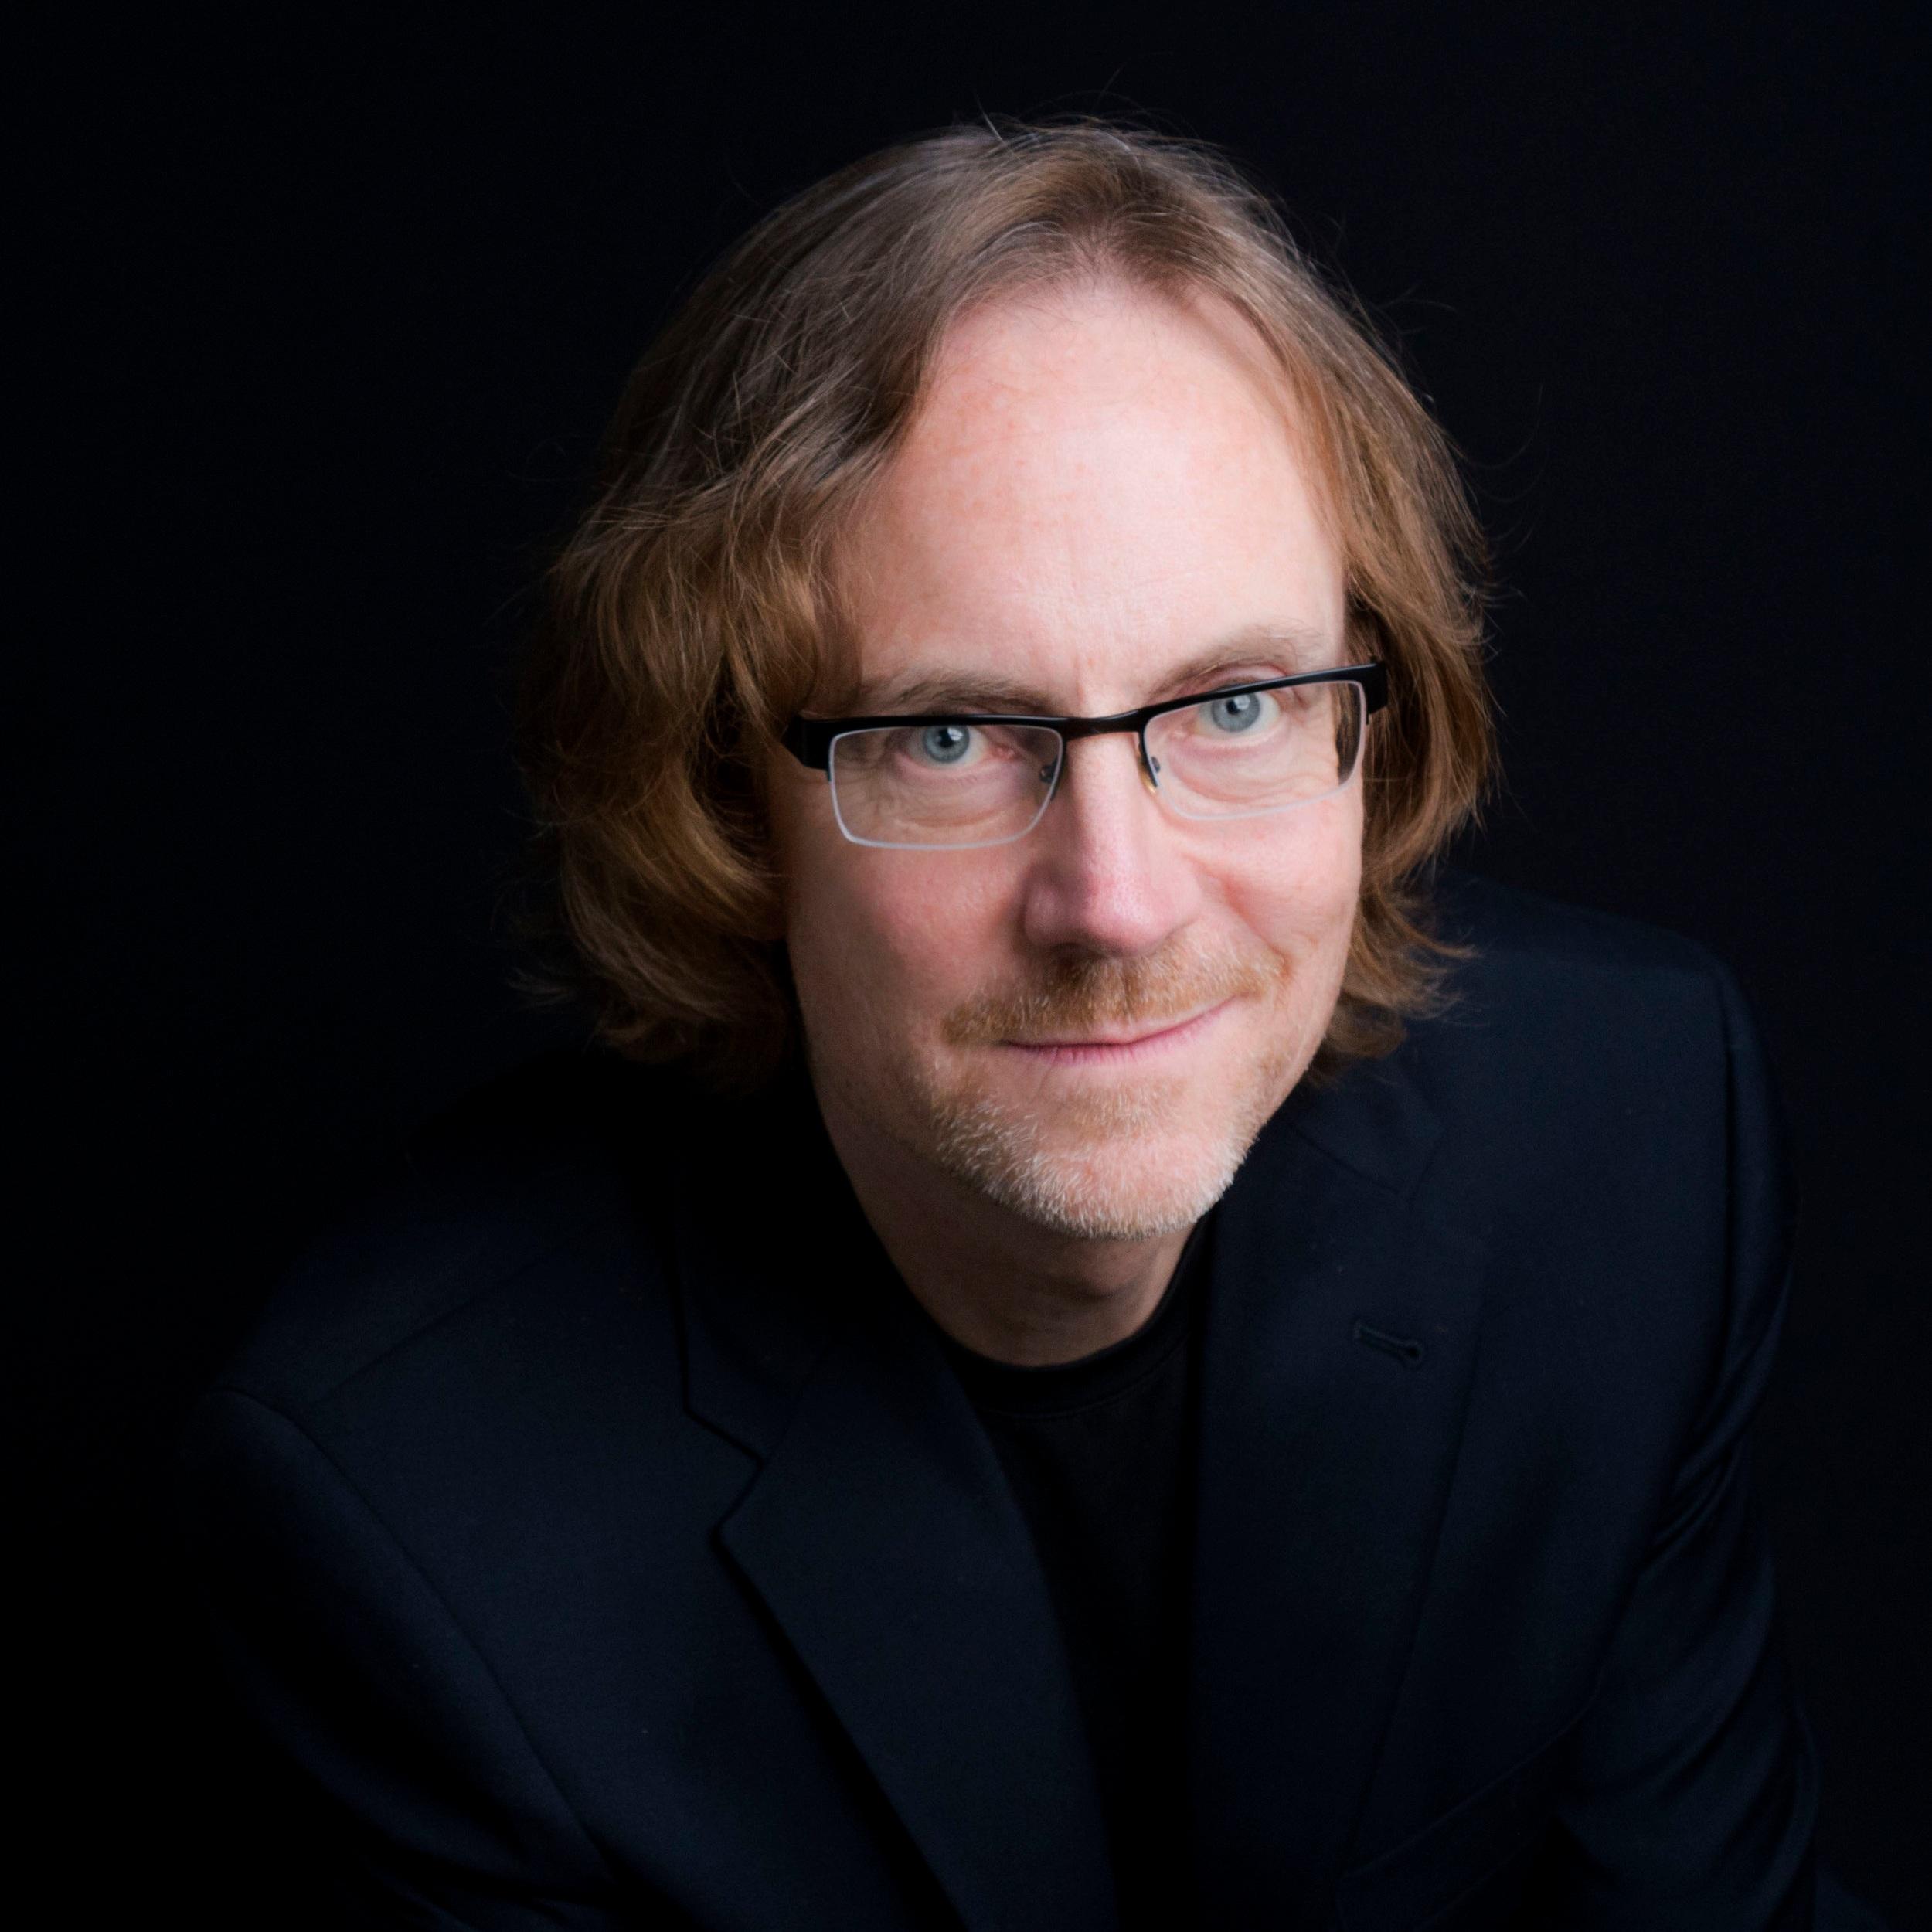 Brian M. Delaney - Age Reversal Network